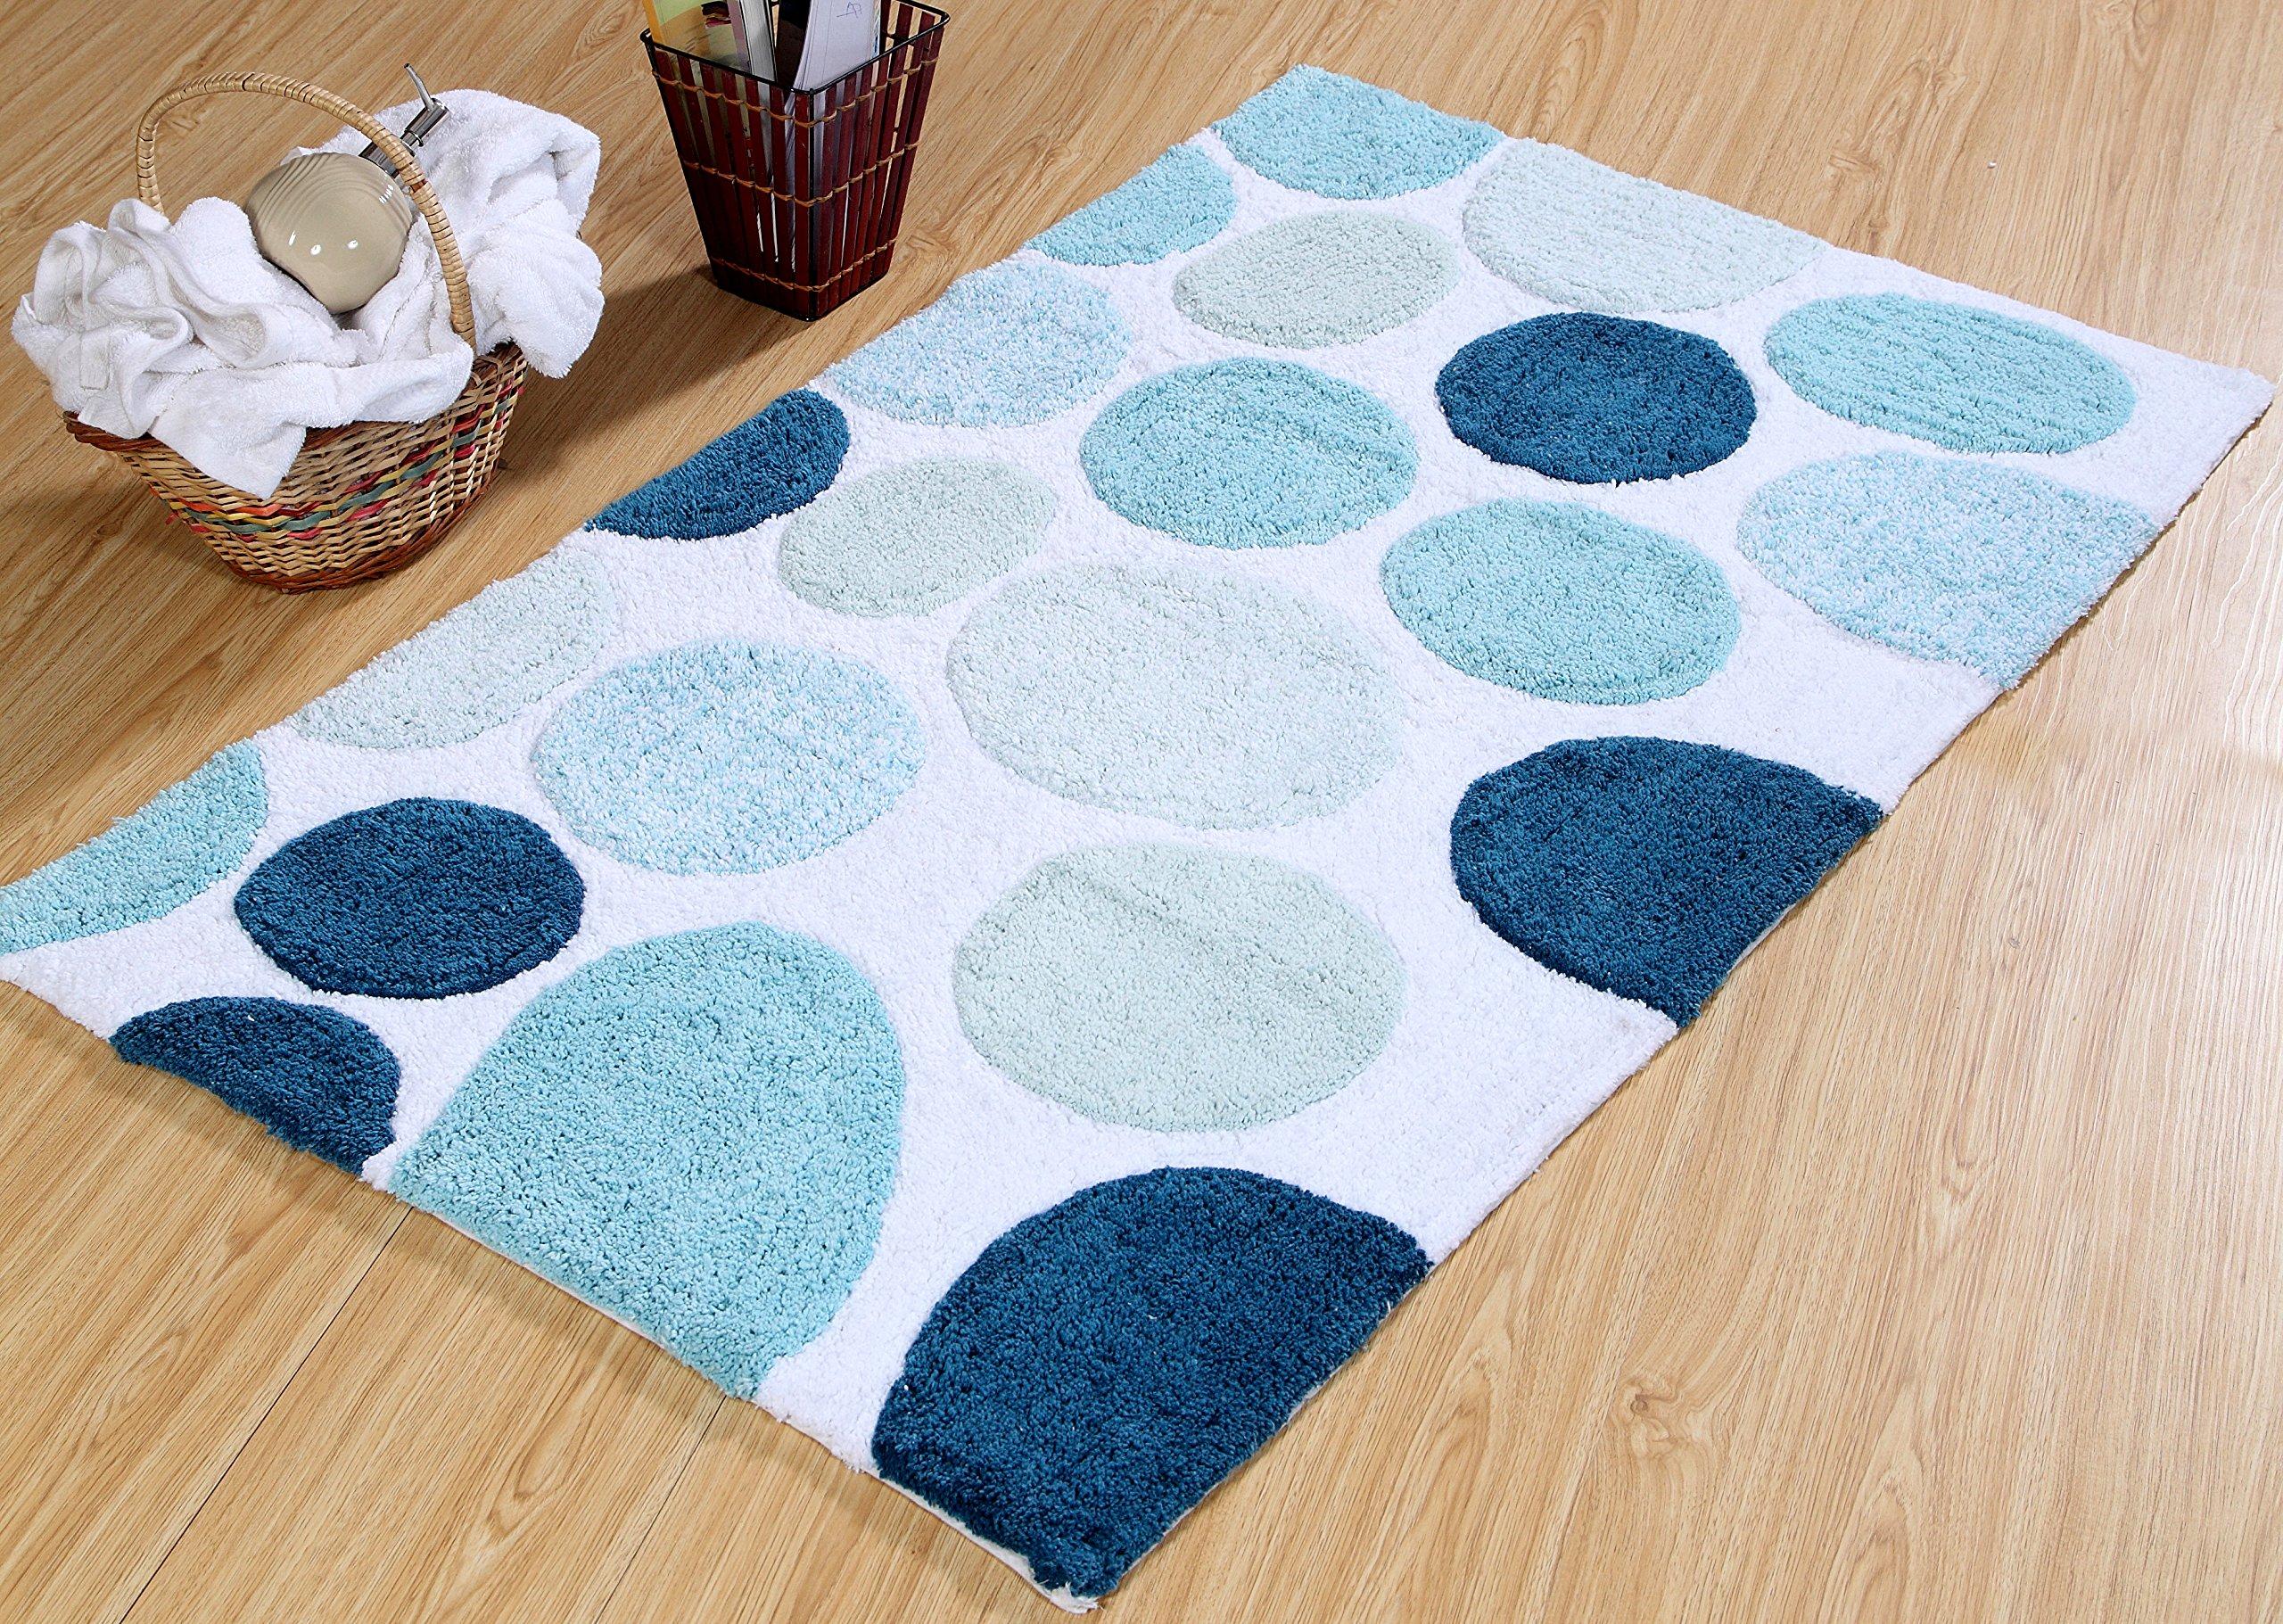 Saffron Fabs Bath Rug 100% Soft Cotton, Size 50x30 Inch, Latex Spray Non-Skid Backing, Multiple Blue Color Pebble Stone Pattern, Machine Washable